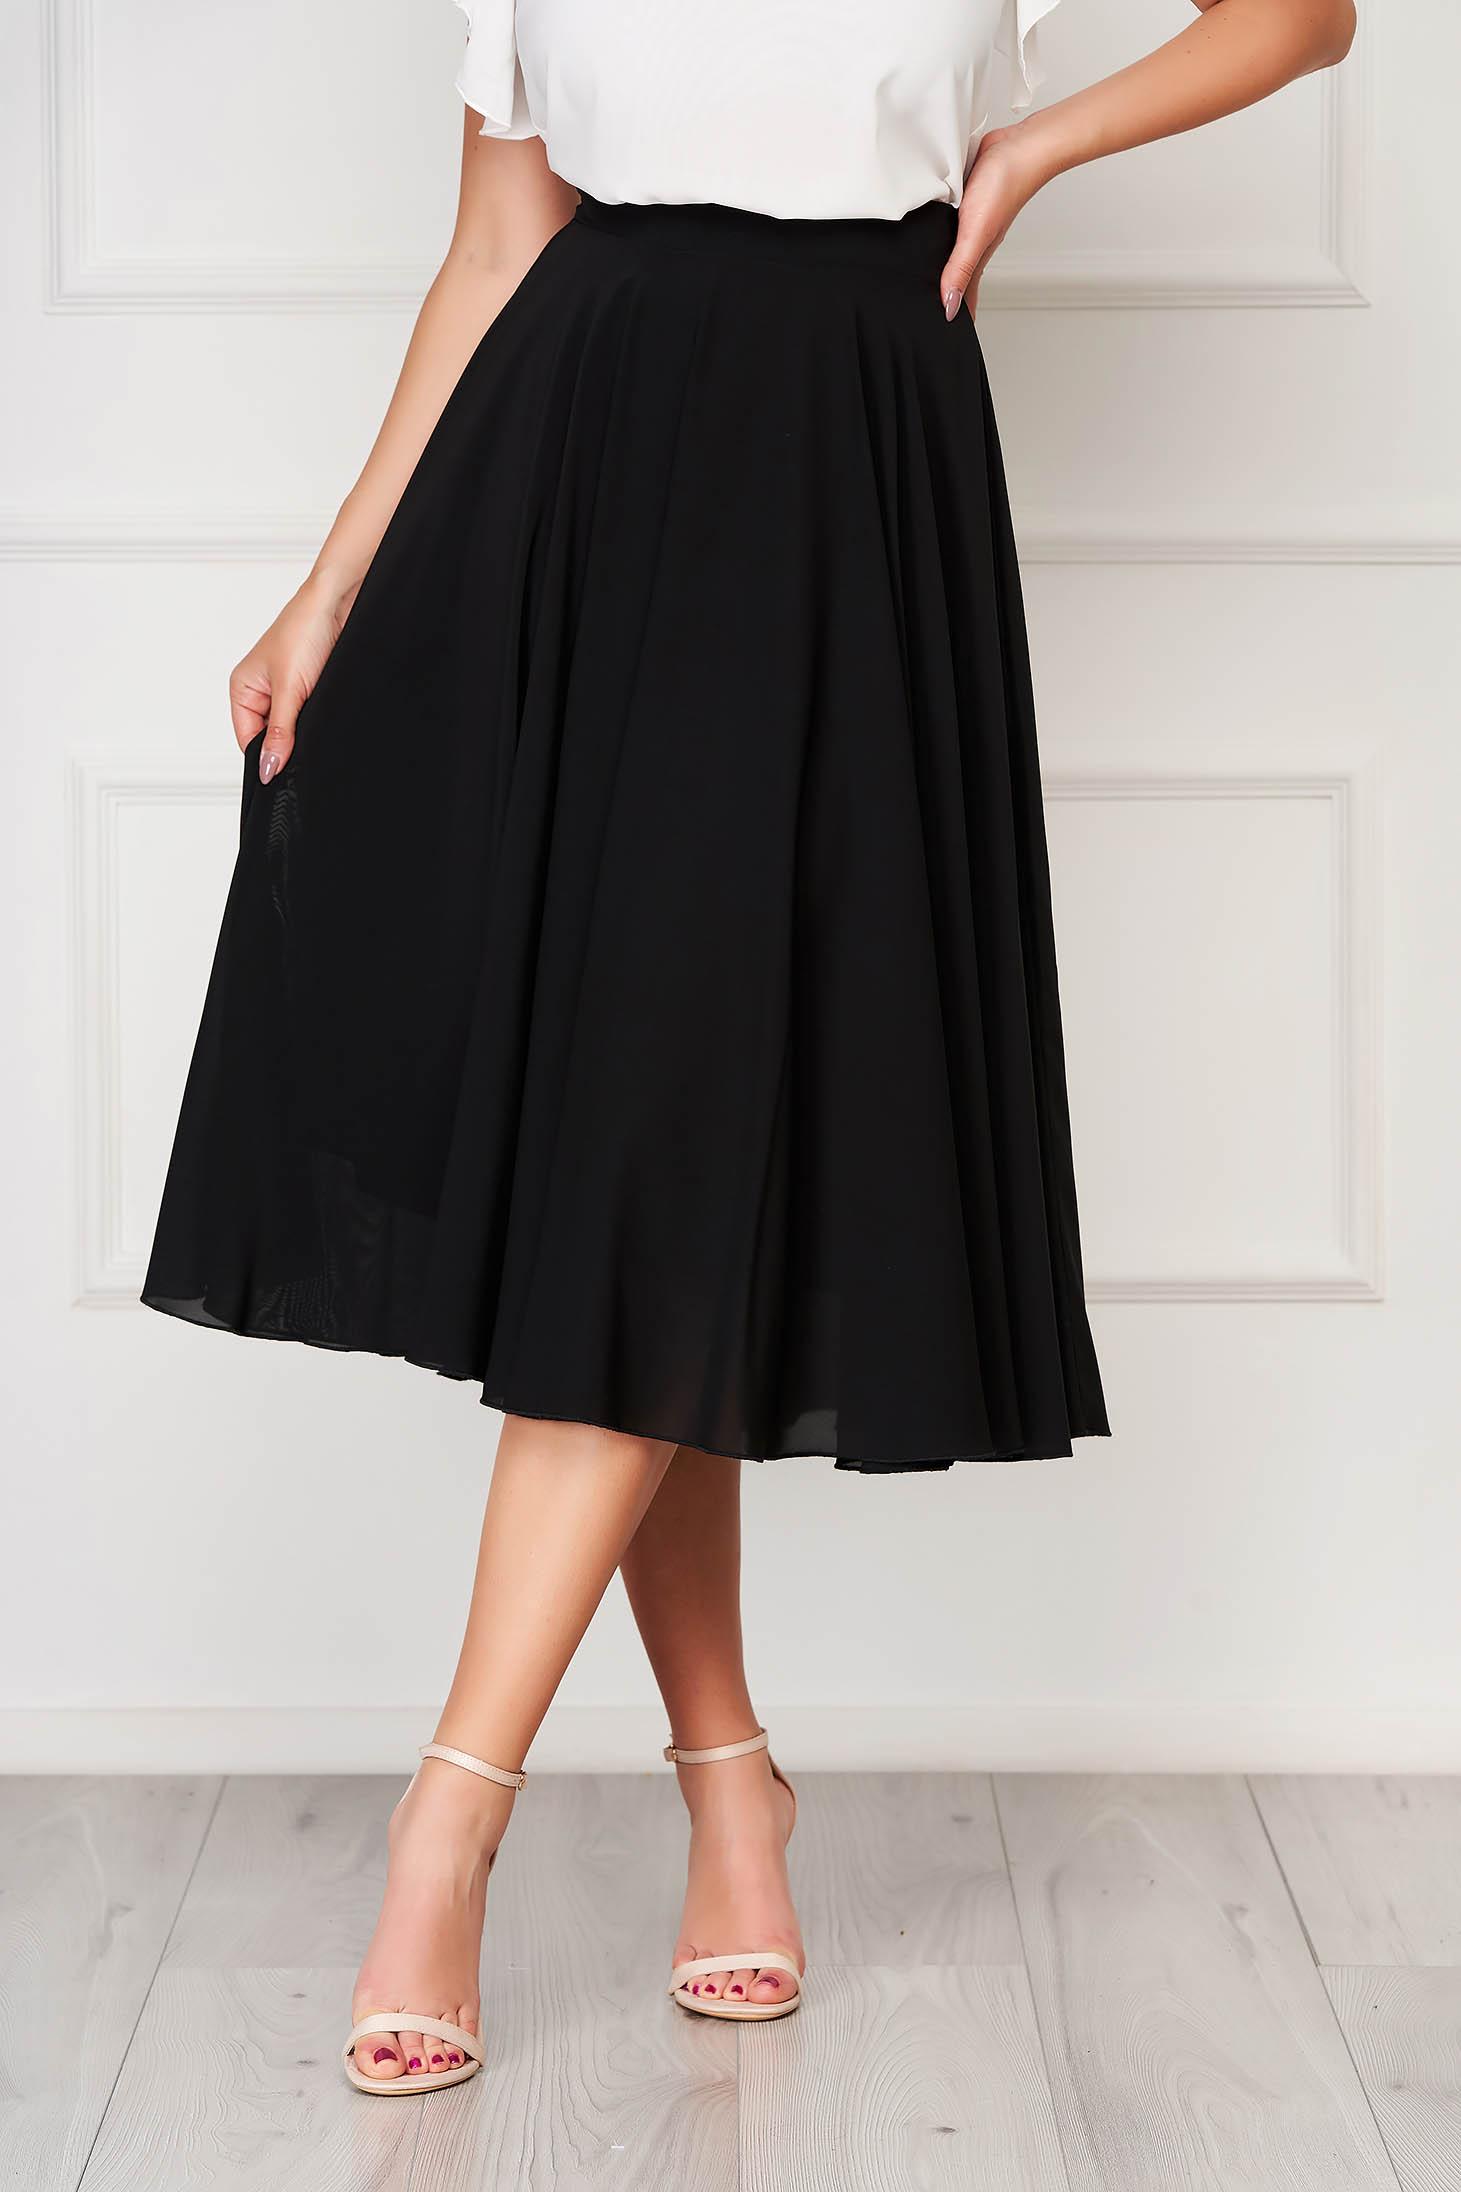 StarShinerS black skirt elegant midi cloche from veil fabric high waisted